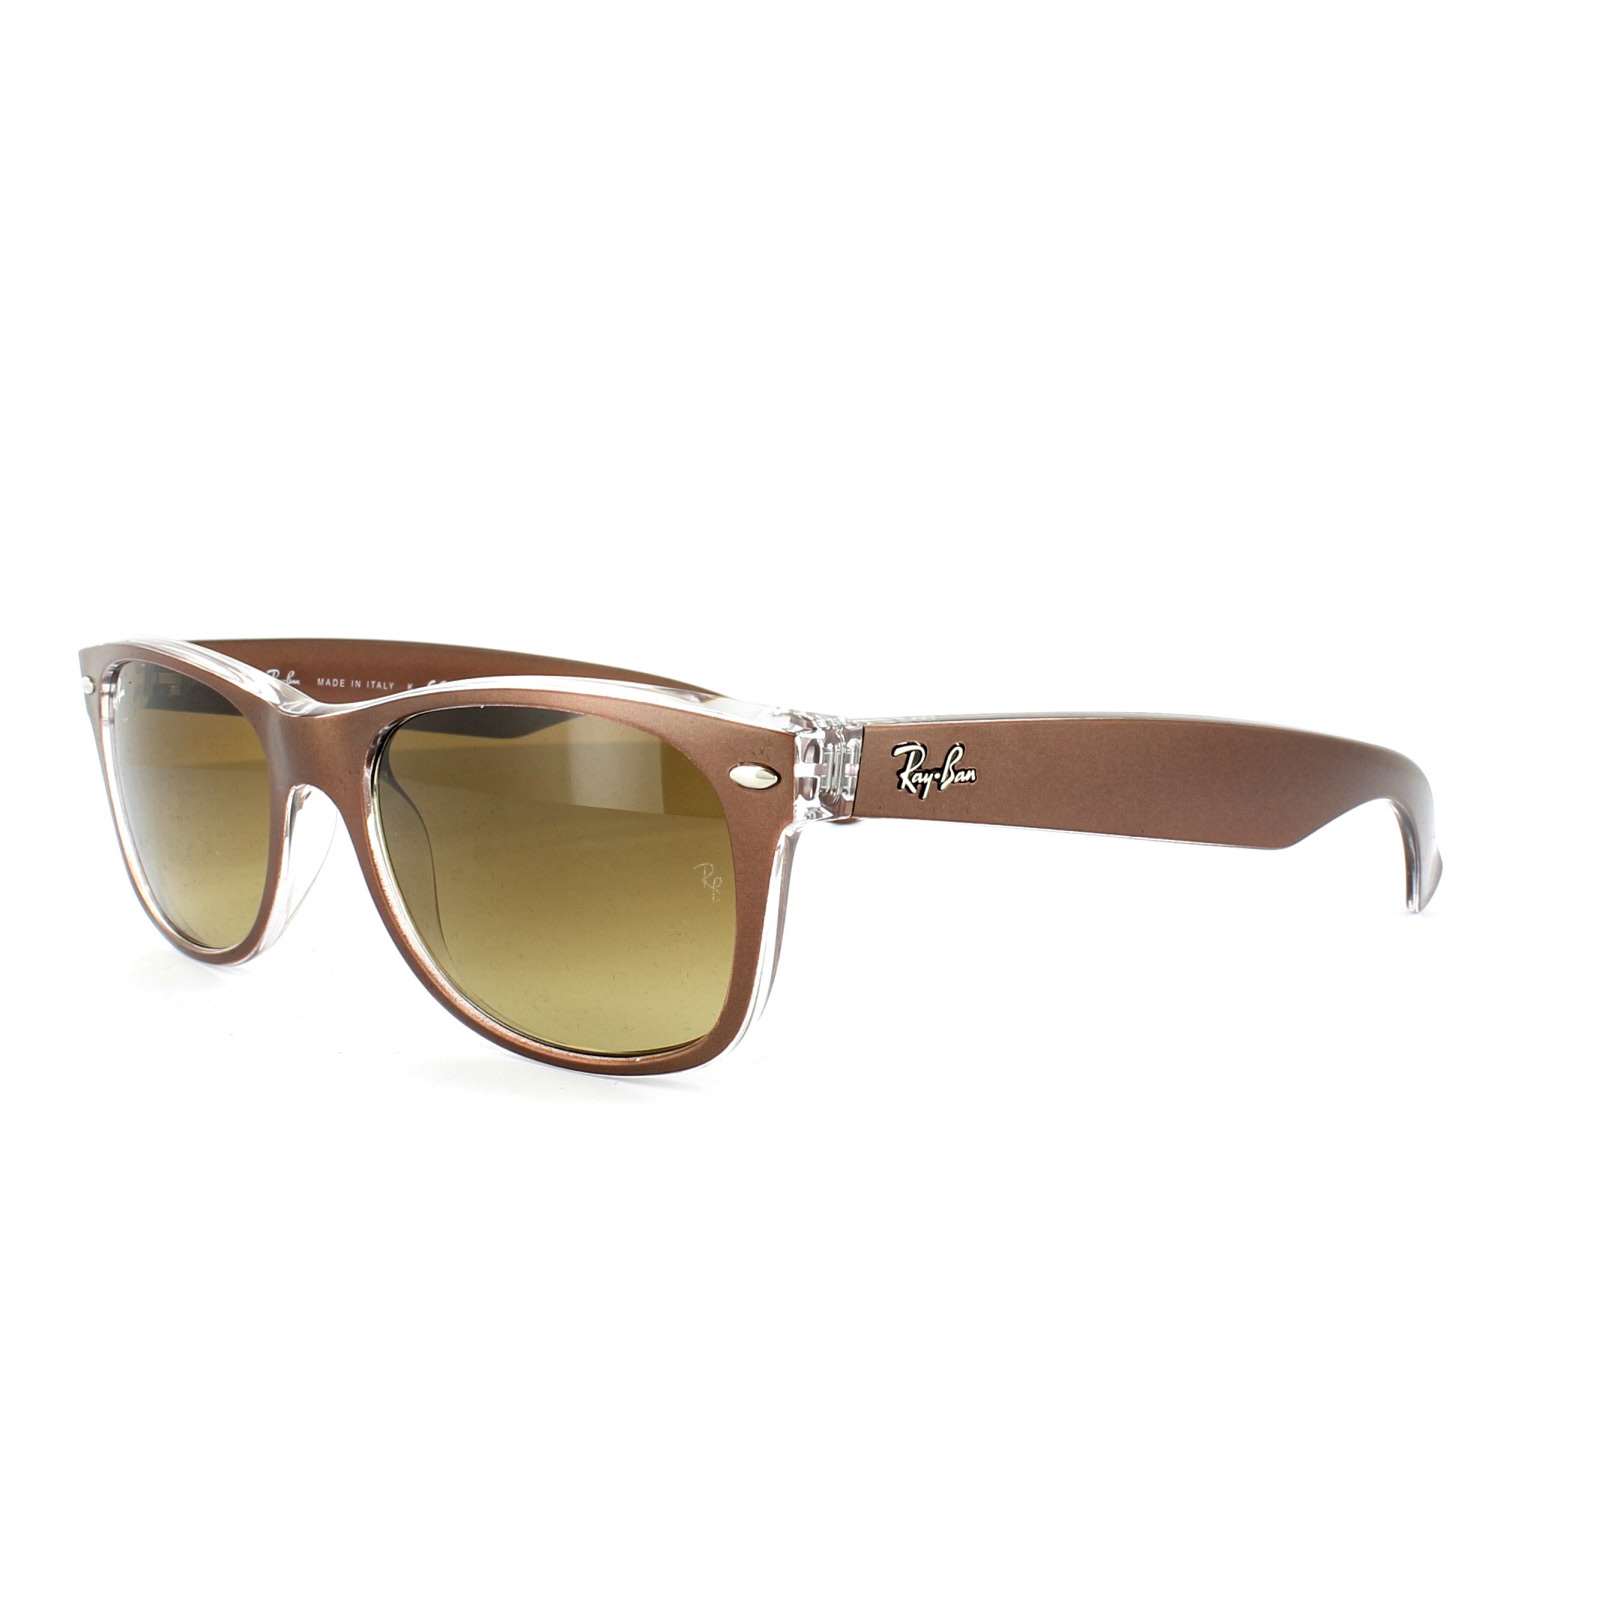 ray ban wayfarer sunglasses ebay uk